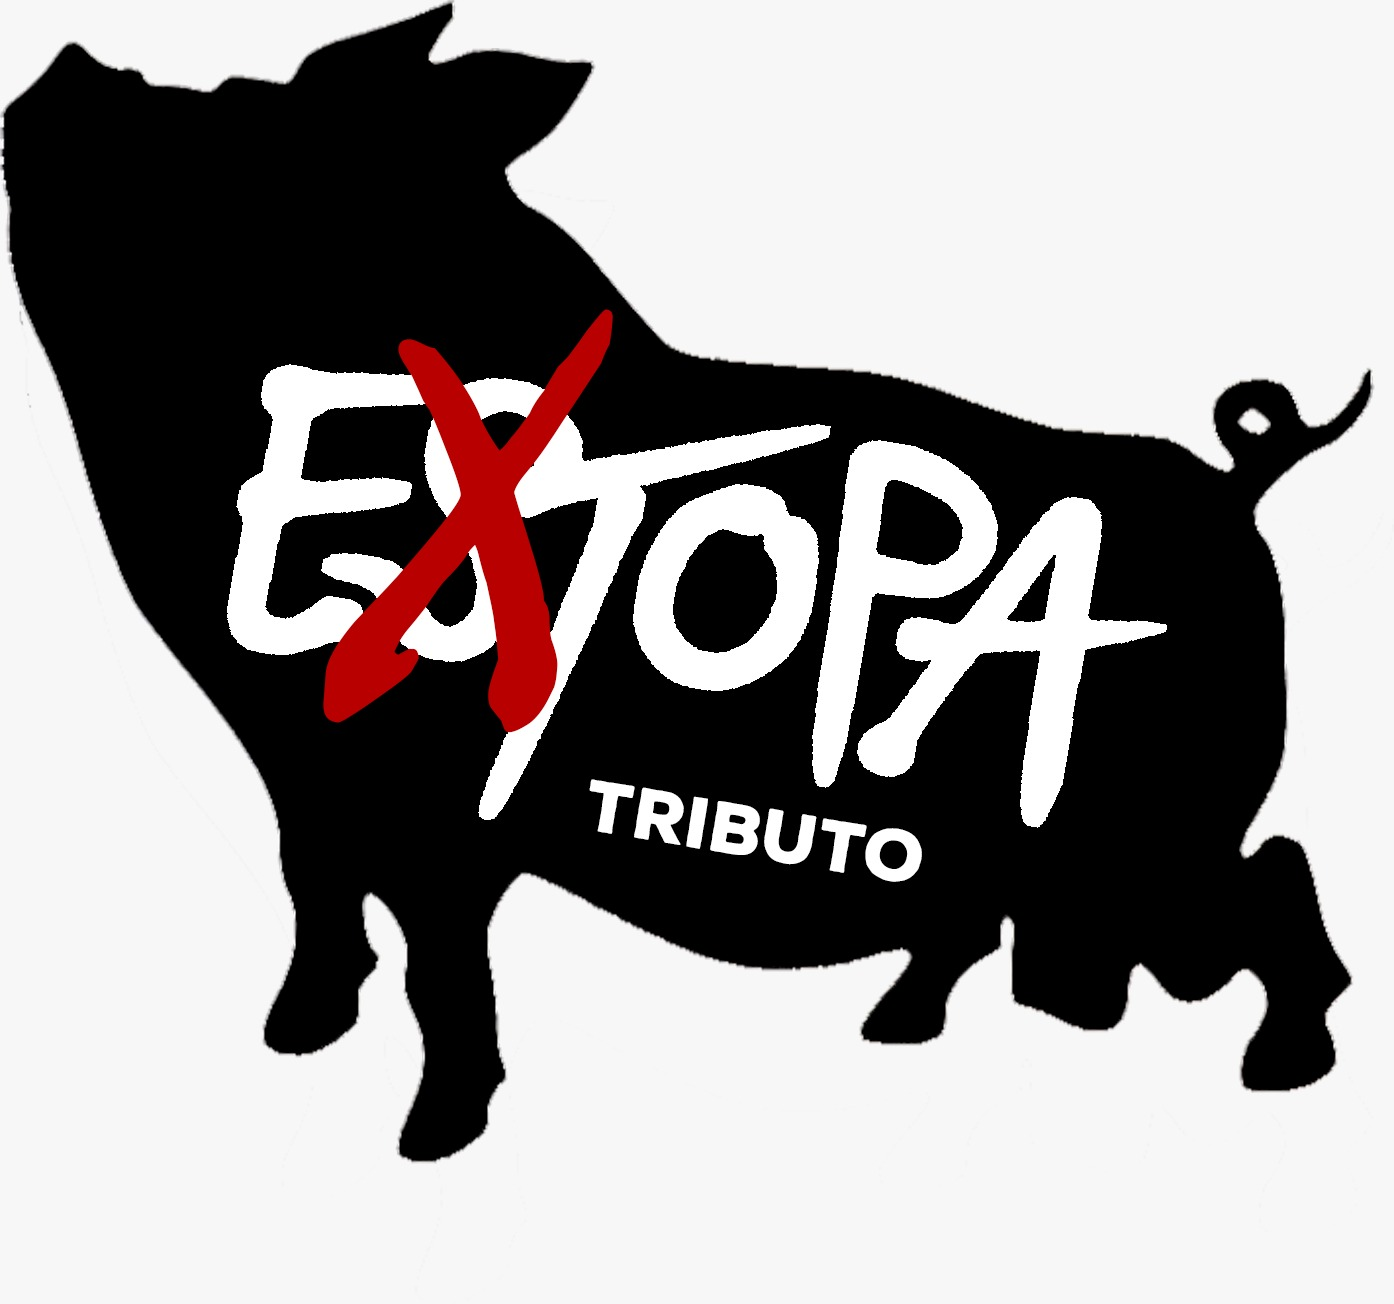 logo Extopa tributo a Estopa